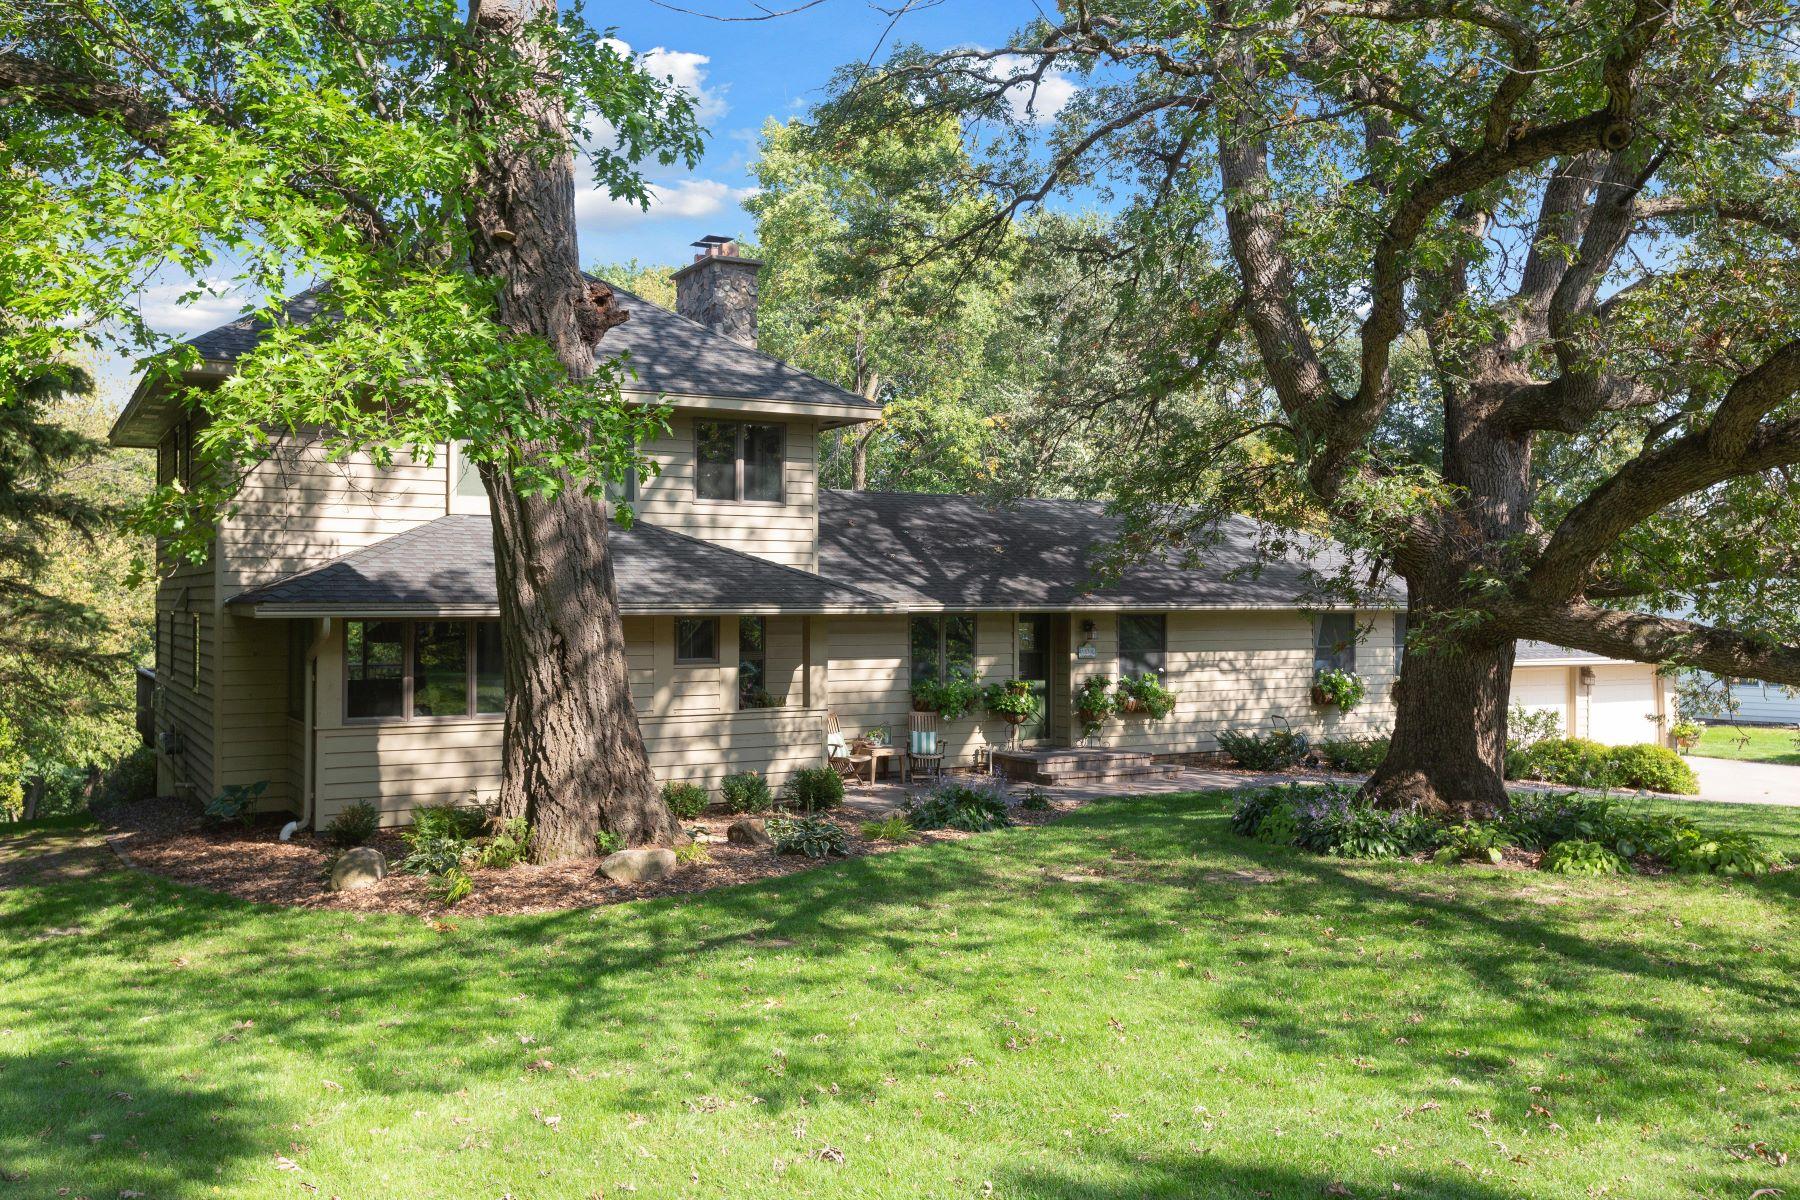 "Single Family Homes for Sale at 4 Bedroom Home Located in Holdridge ""Hidden Gem"" Wayzata 15706 Holdridge Road E Wayzata, Minnesota 55391 United States"